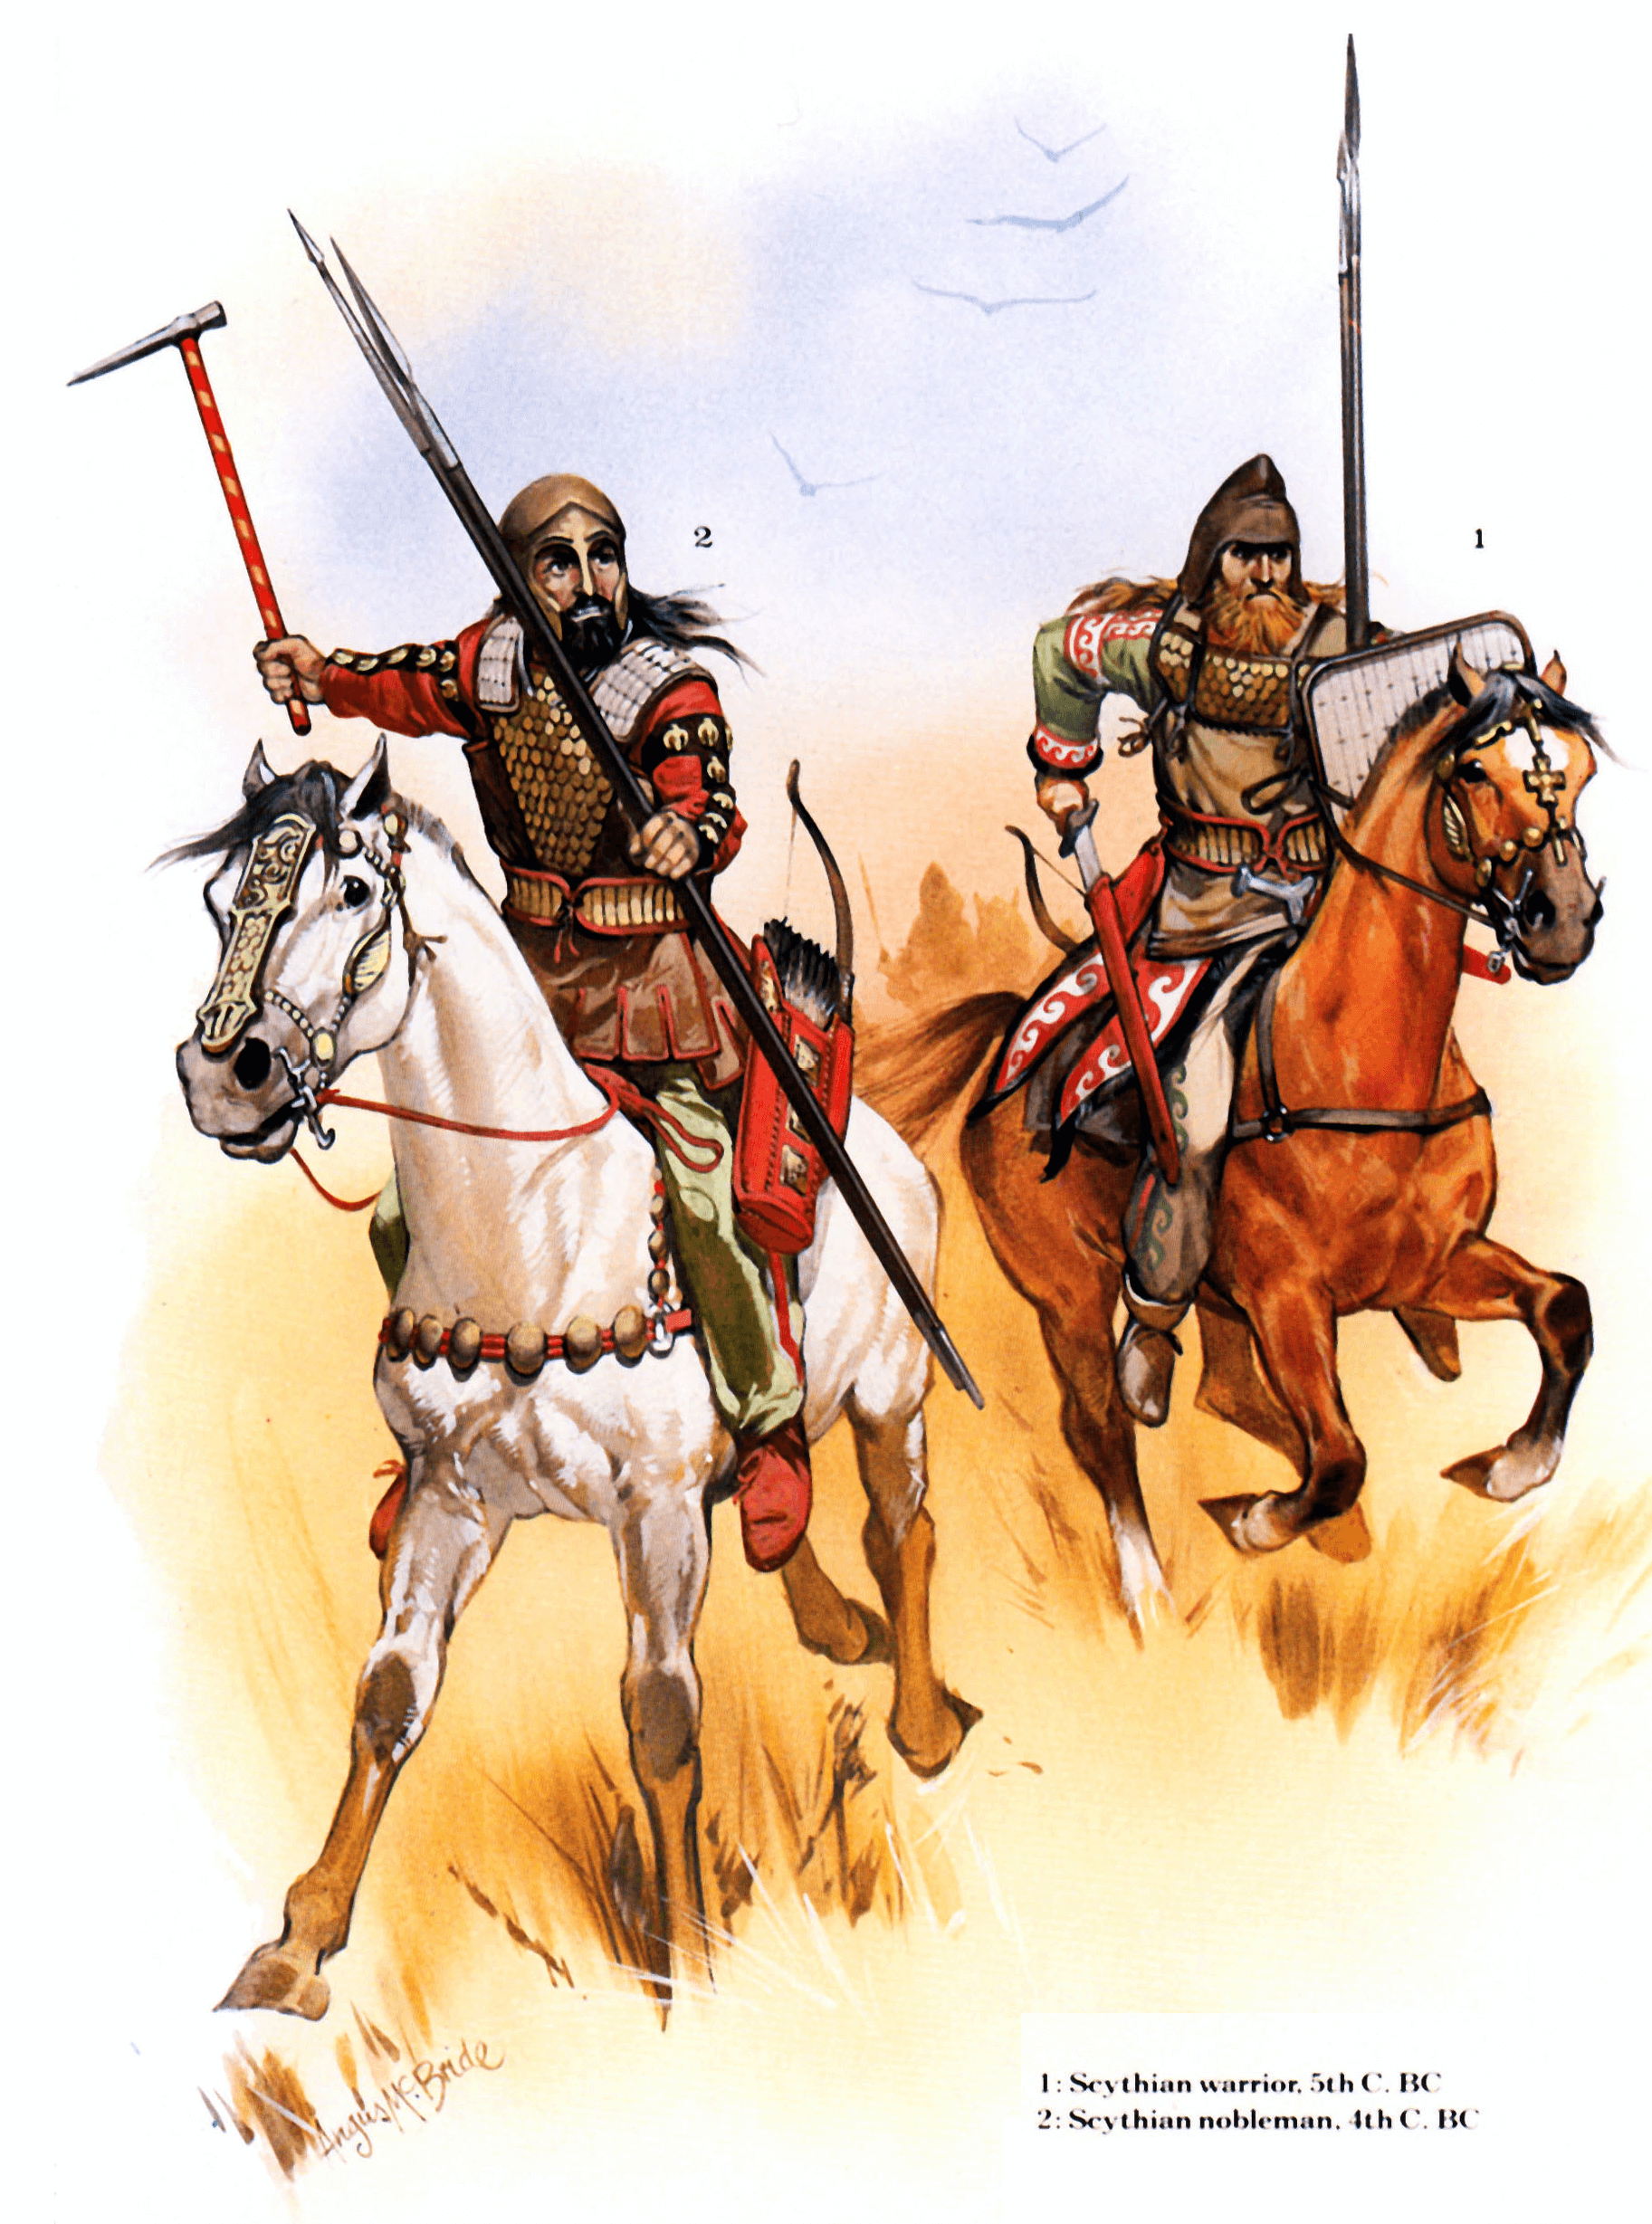 Jinetes escitas siglo V AC: 1 Guerrero escita 2 Noble escita o nomarchos. Autor Angus McBride para Osprey